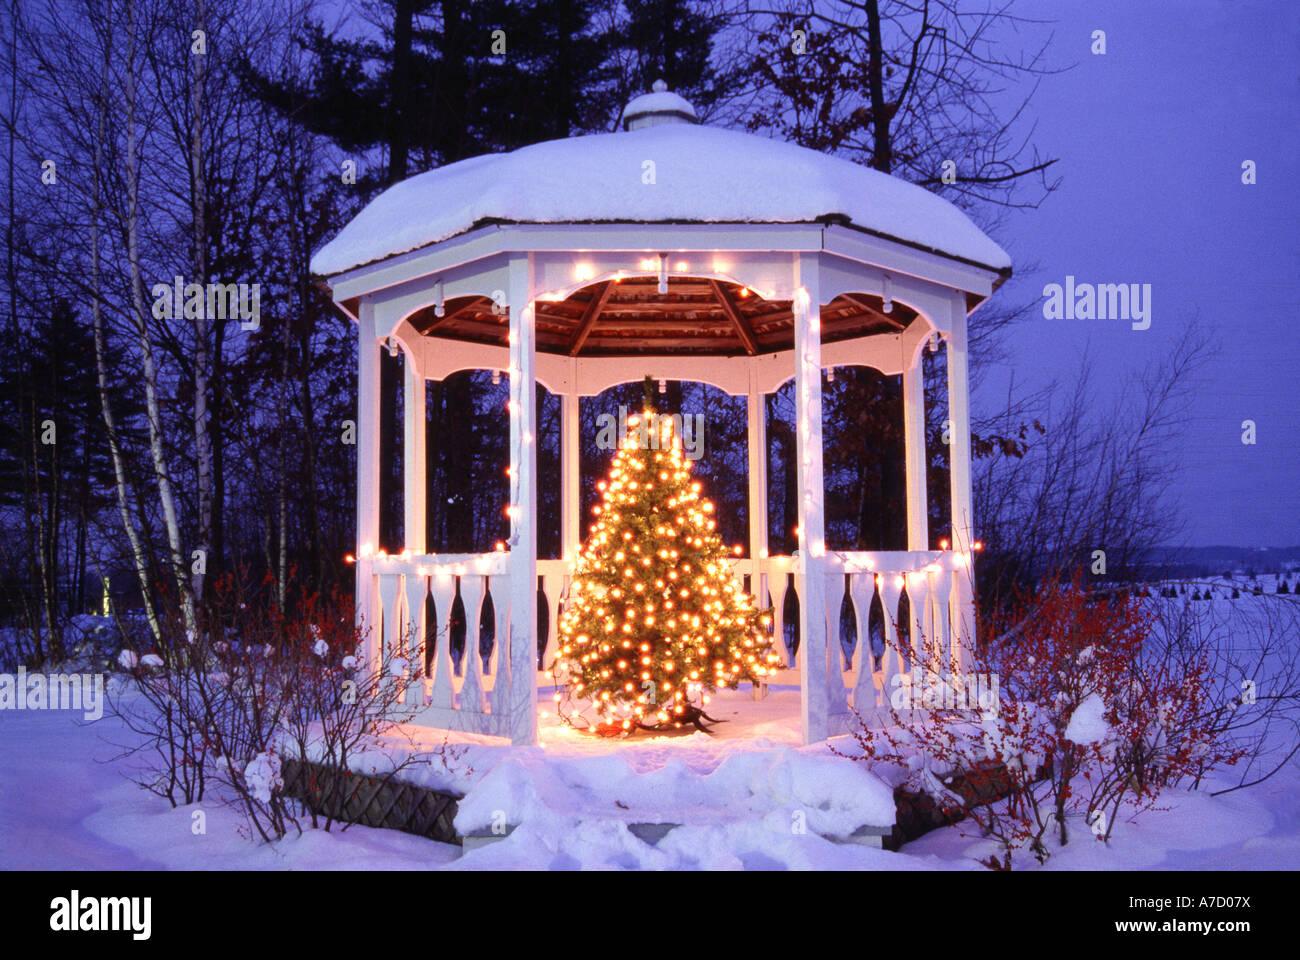 Pagoda & Christmas Tree, 'Inn At Essex' Stock Photo, Royalty Free ...